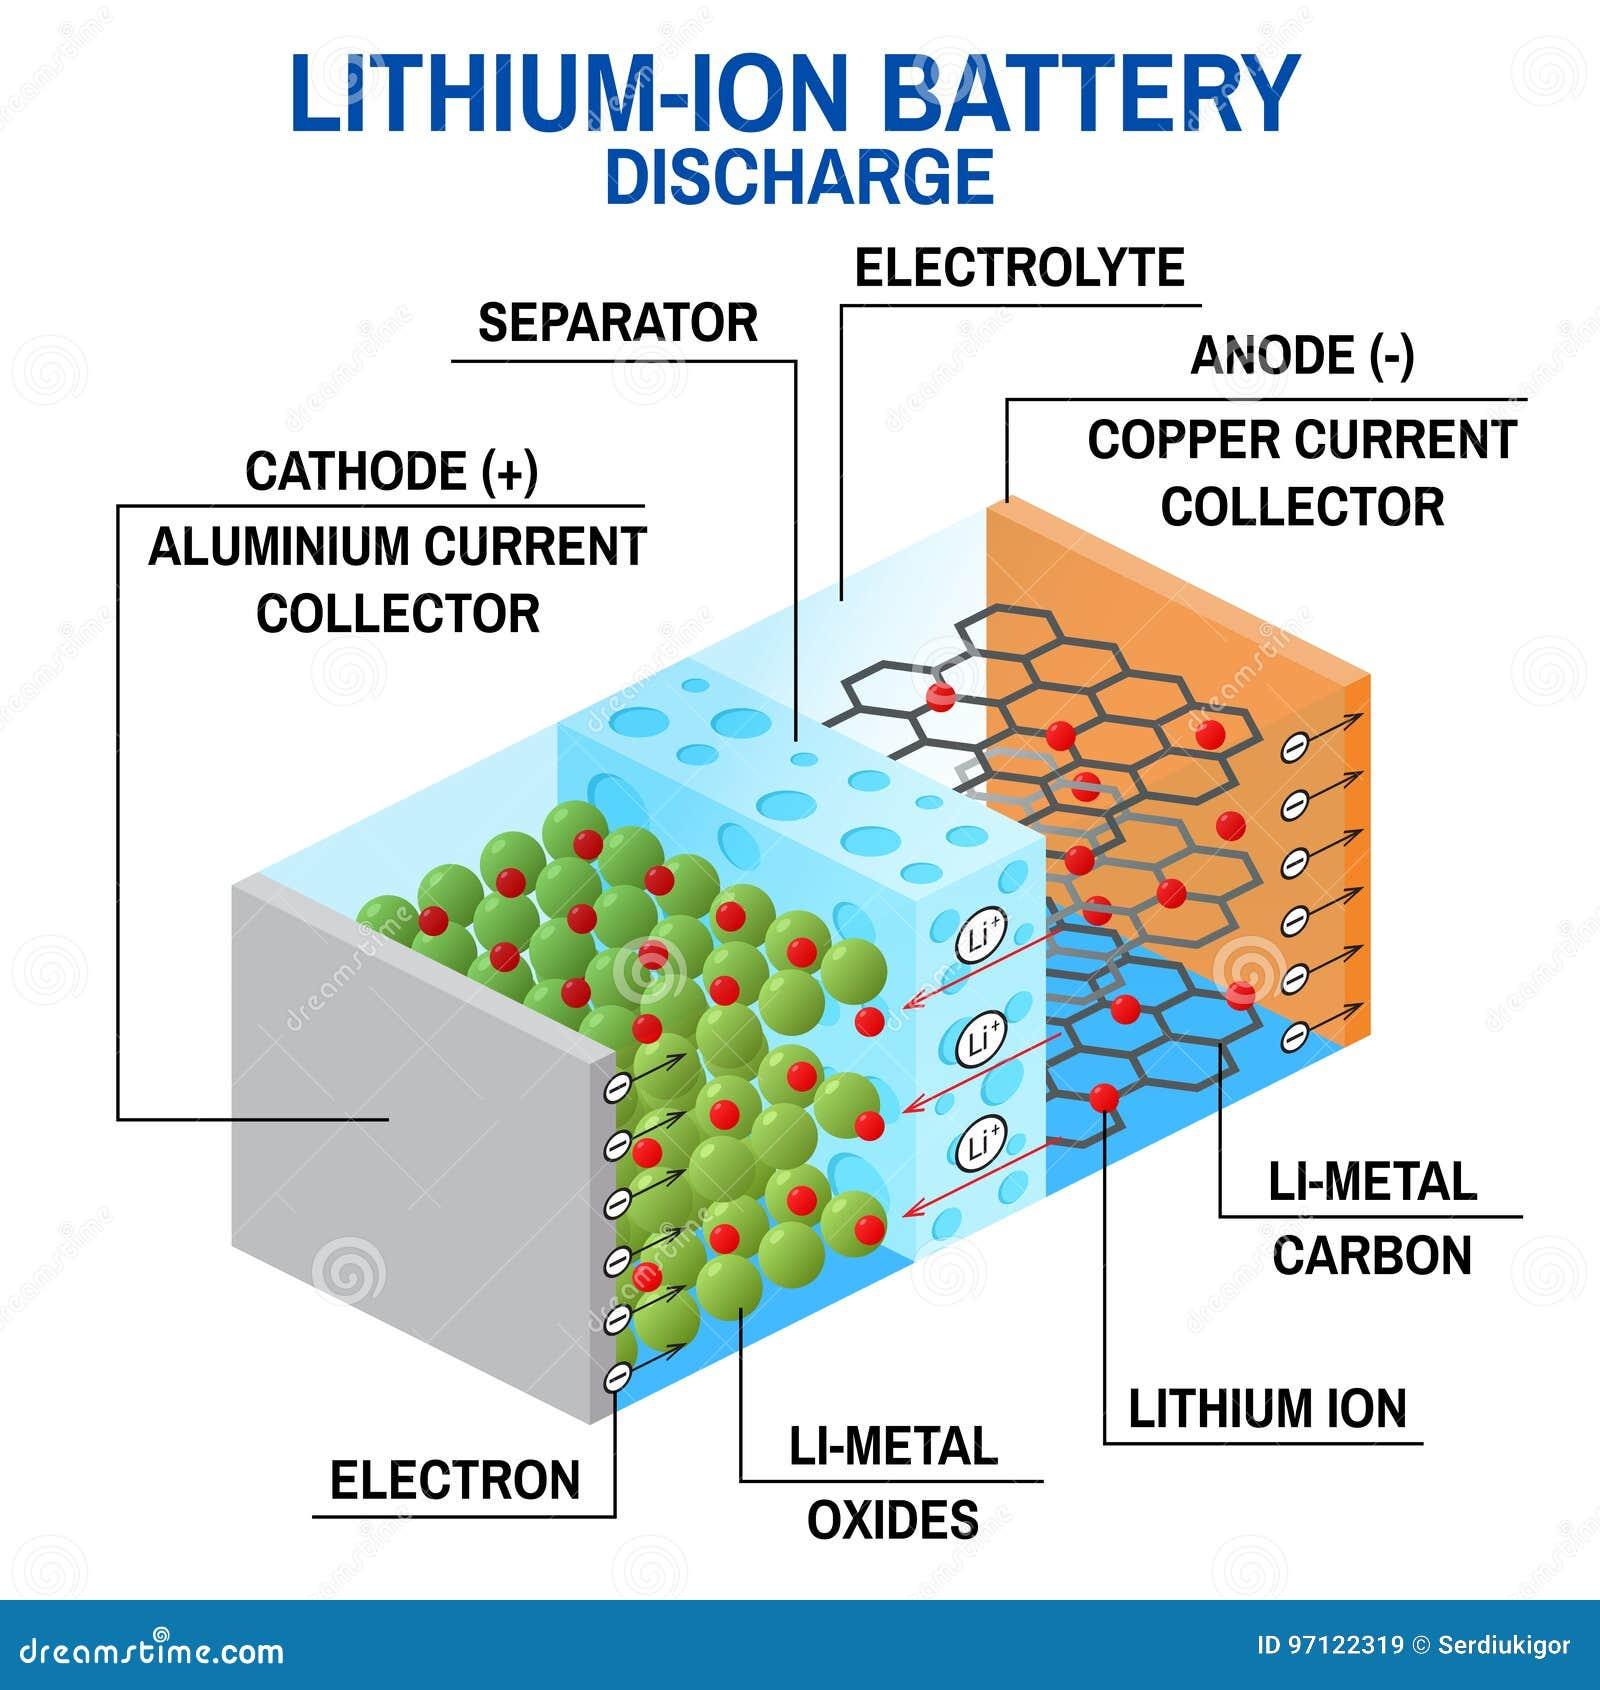 li ion battery diagram stock vector illustration of icon lithium ion atom li ion battery diagram vector